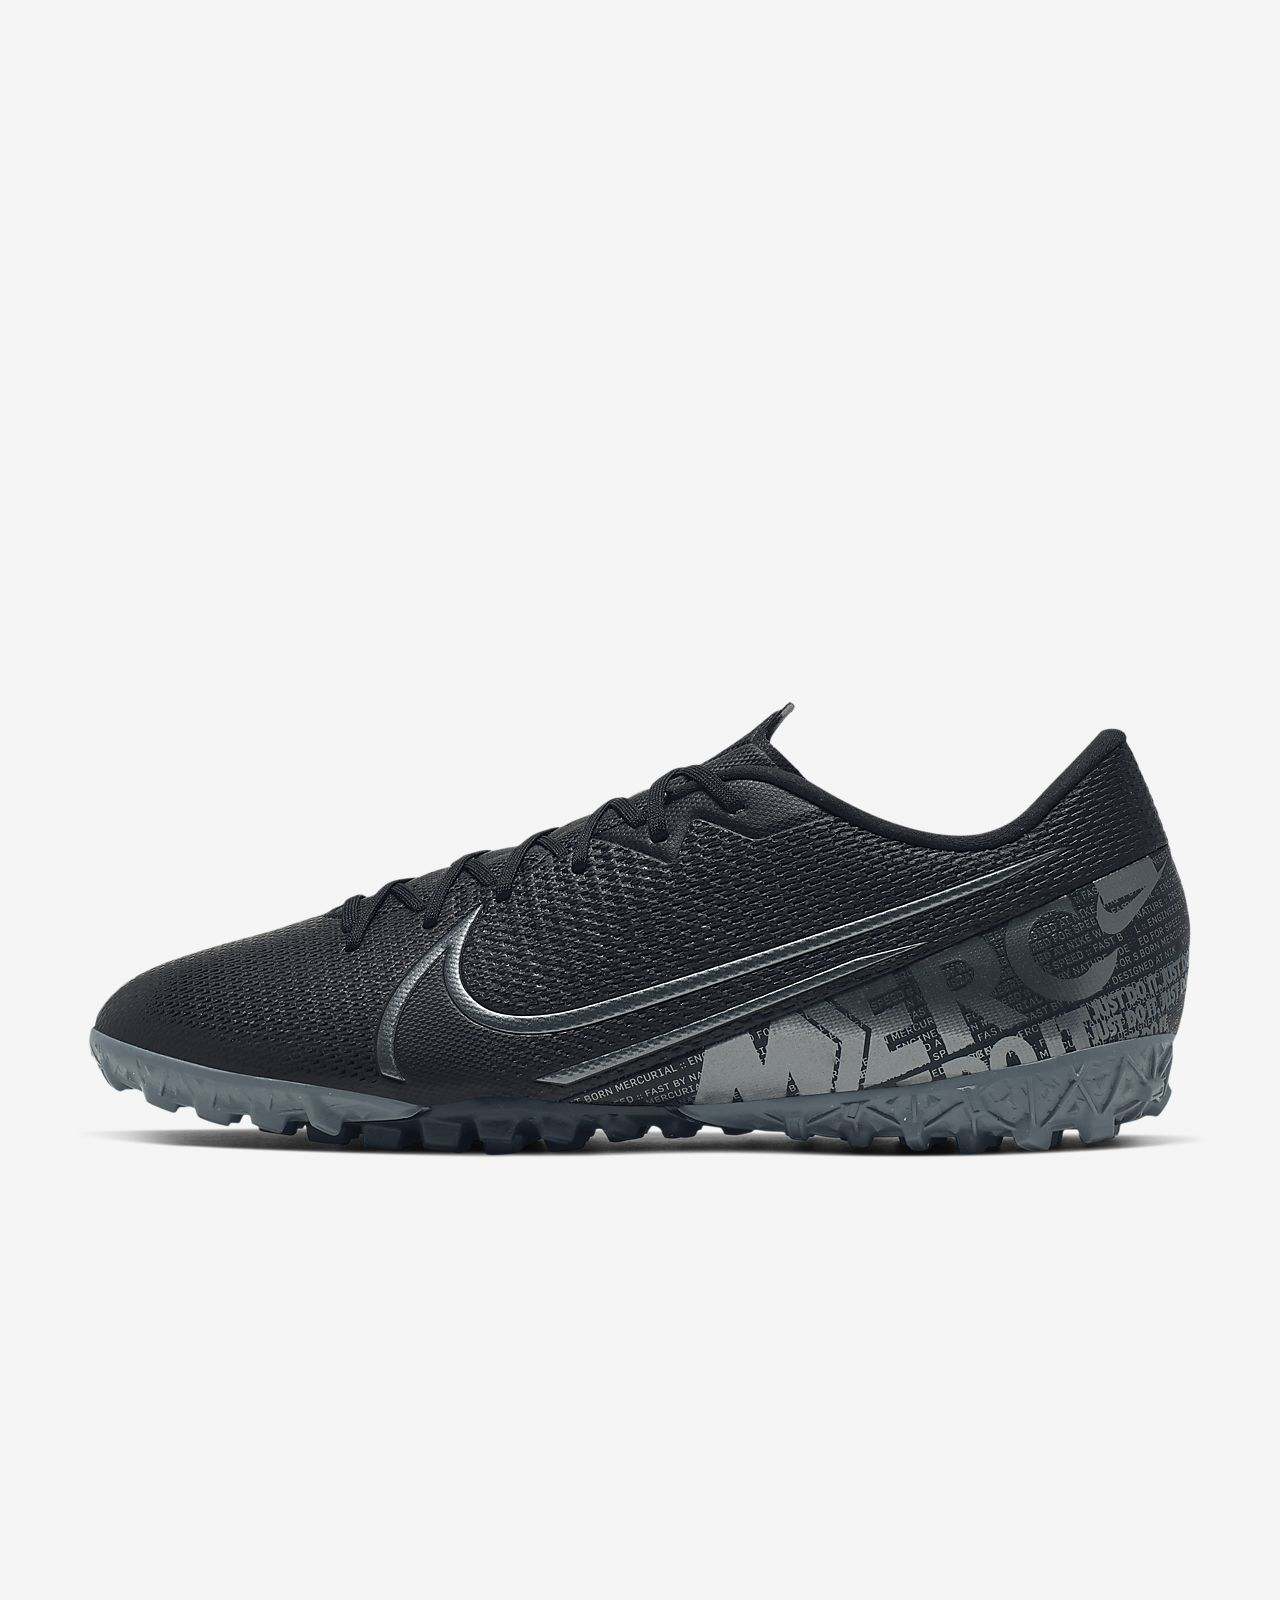 Nike Mercurial Vapor 13 Academy TF Turf Soccer Shoe